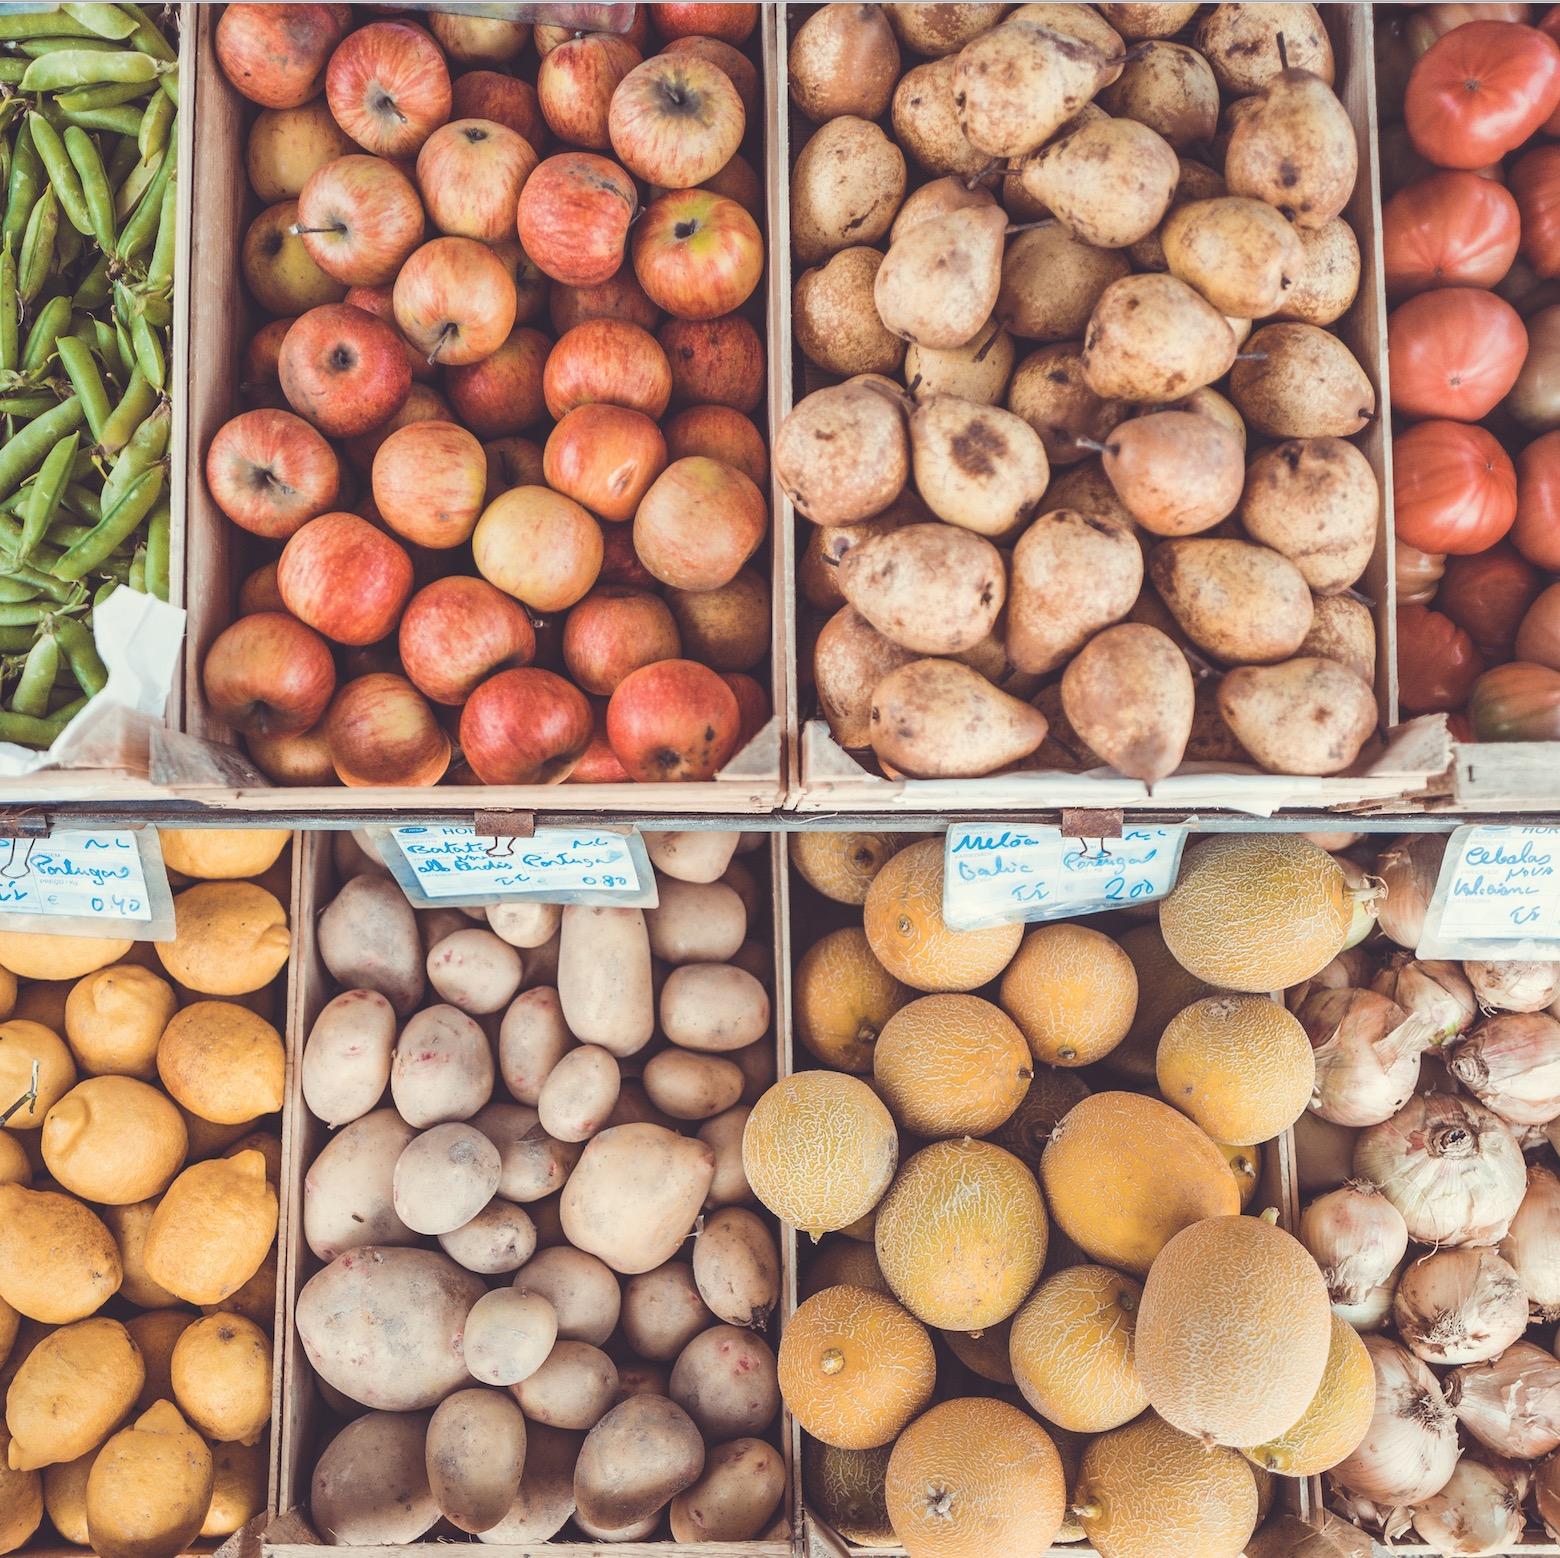 Vitamine, Mineralstoffe & Ballaststoffe?